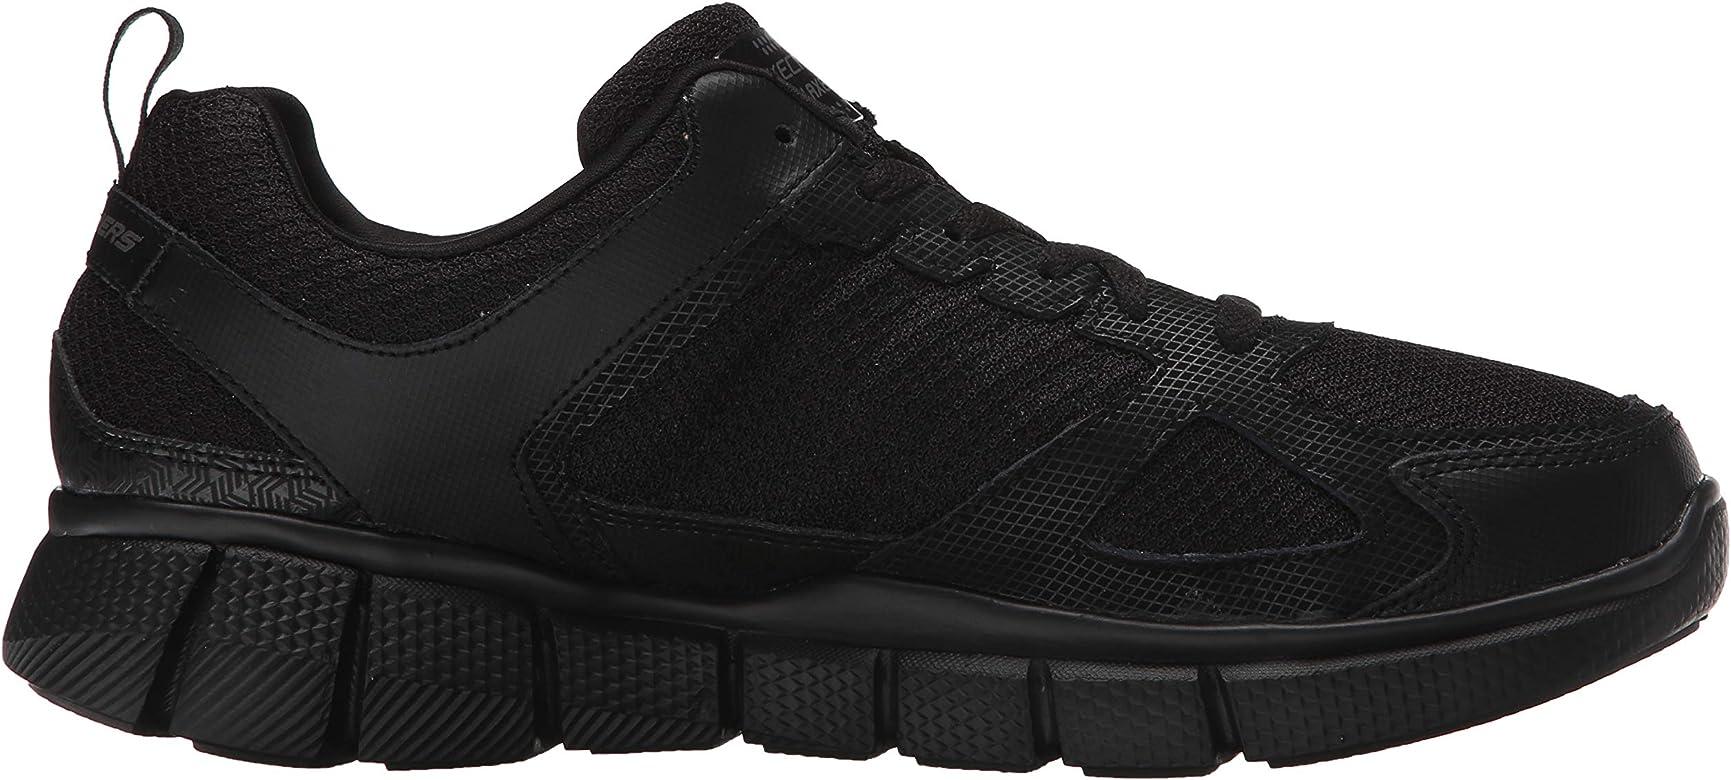 Skechers Men's Equalizer 2.0 True Balance Sneaker Black